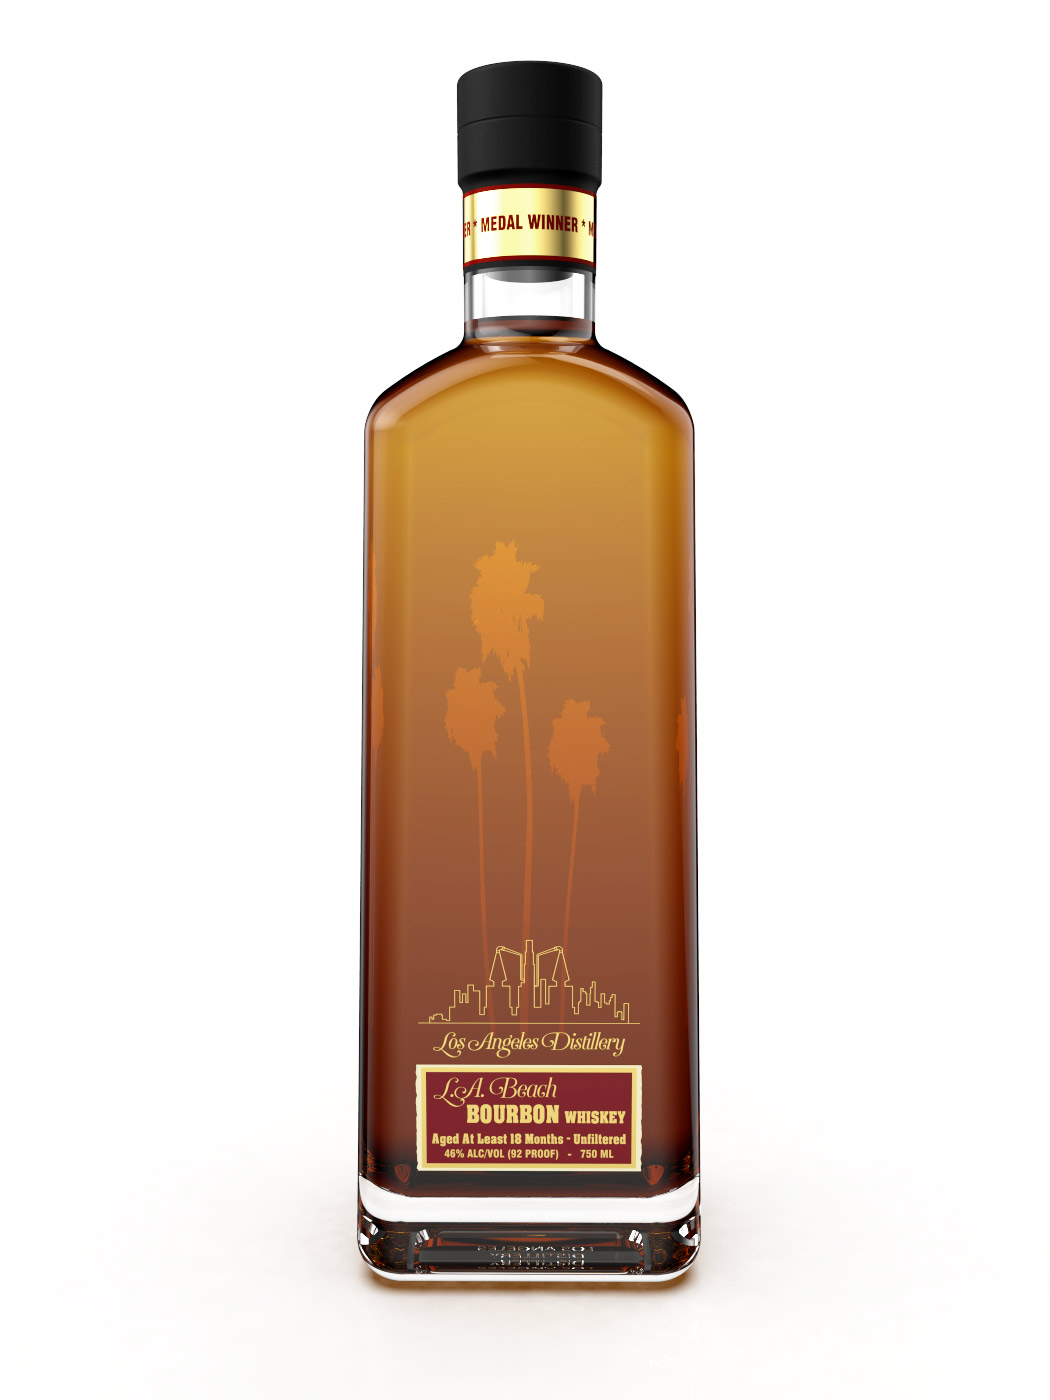 LA Distillery LA Beach 18 Months 92 Proof Bourbon Whiskey